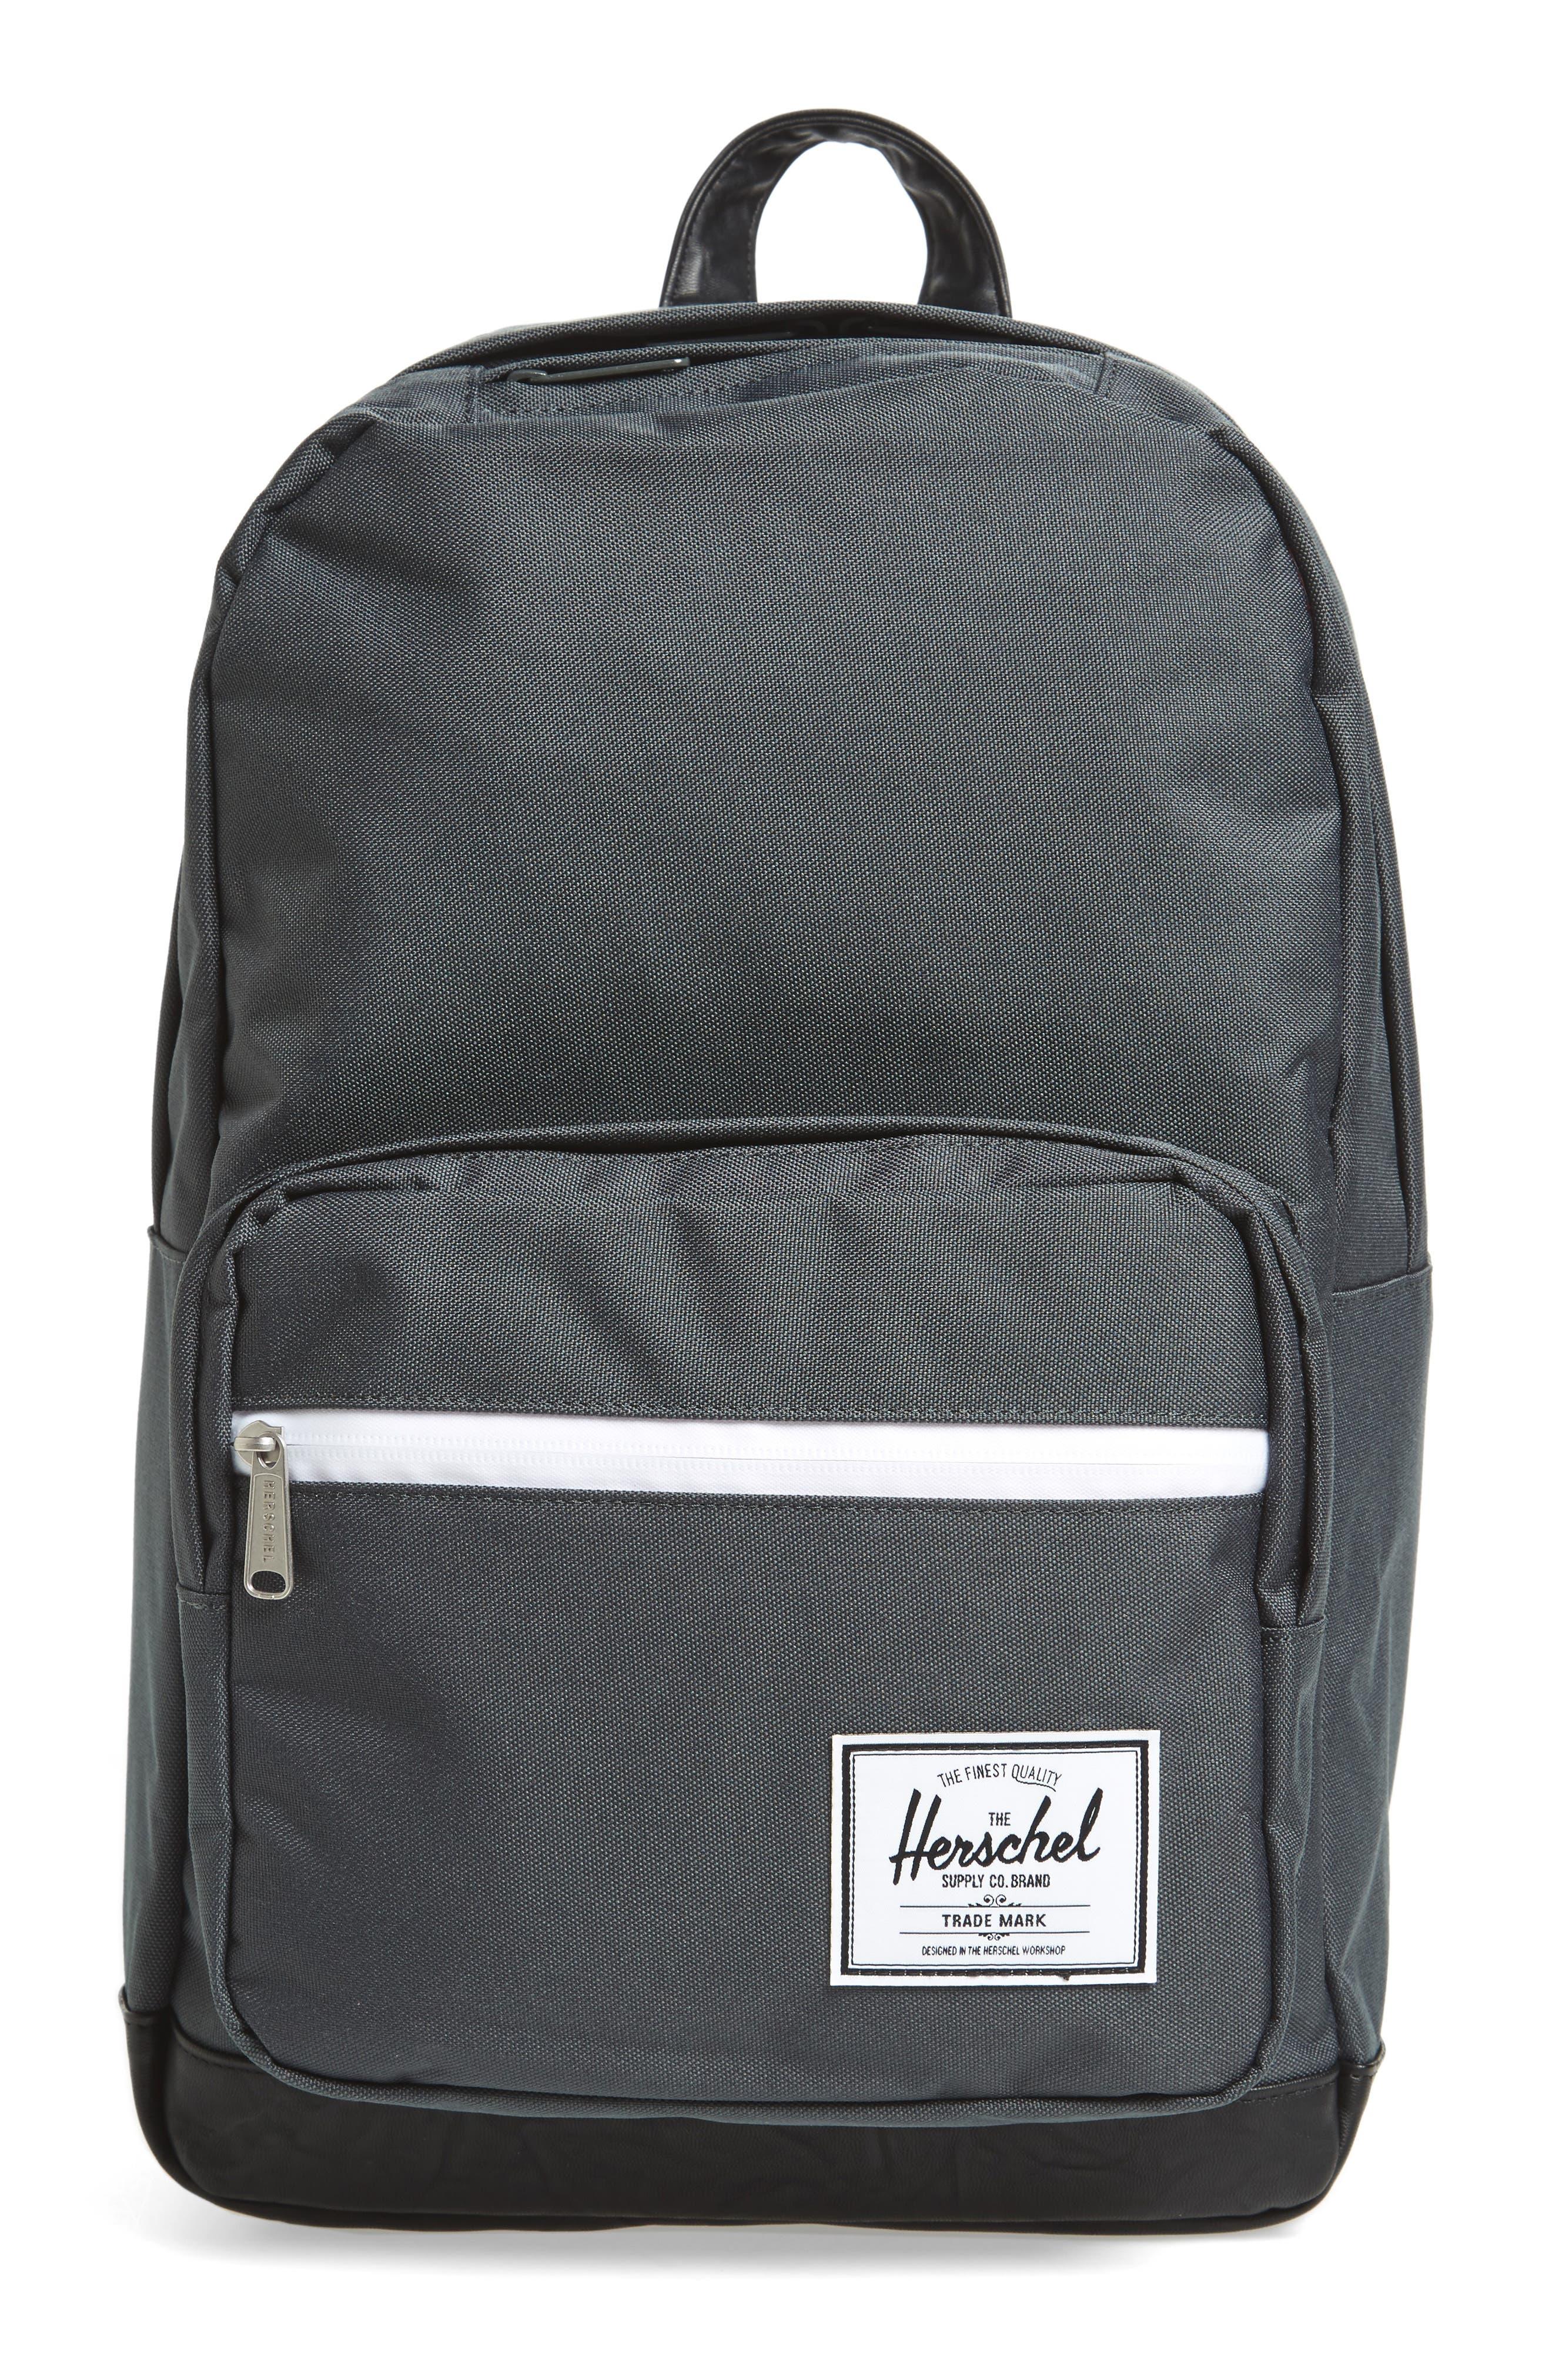 HERSCHEL SUPPLY CO., 'Pop Quiz' Backpack, Main thumbnail 1, color, 081